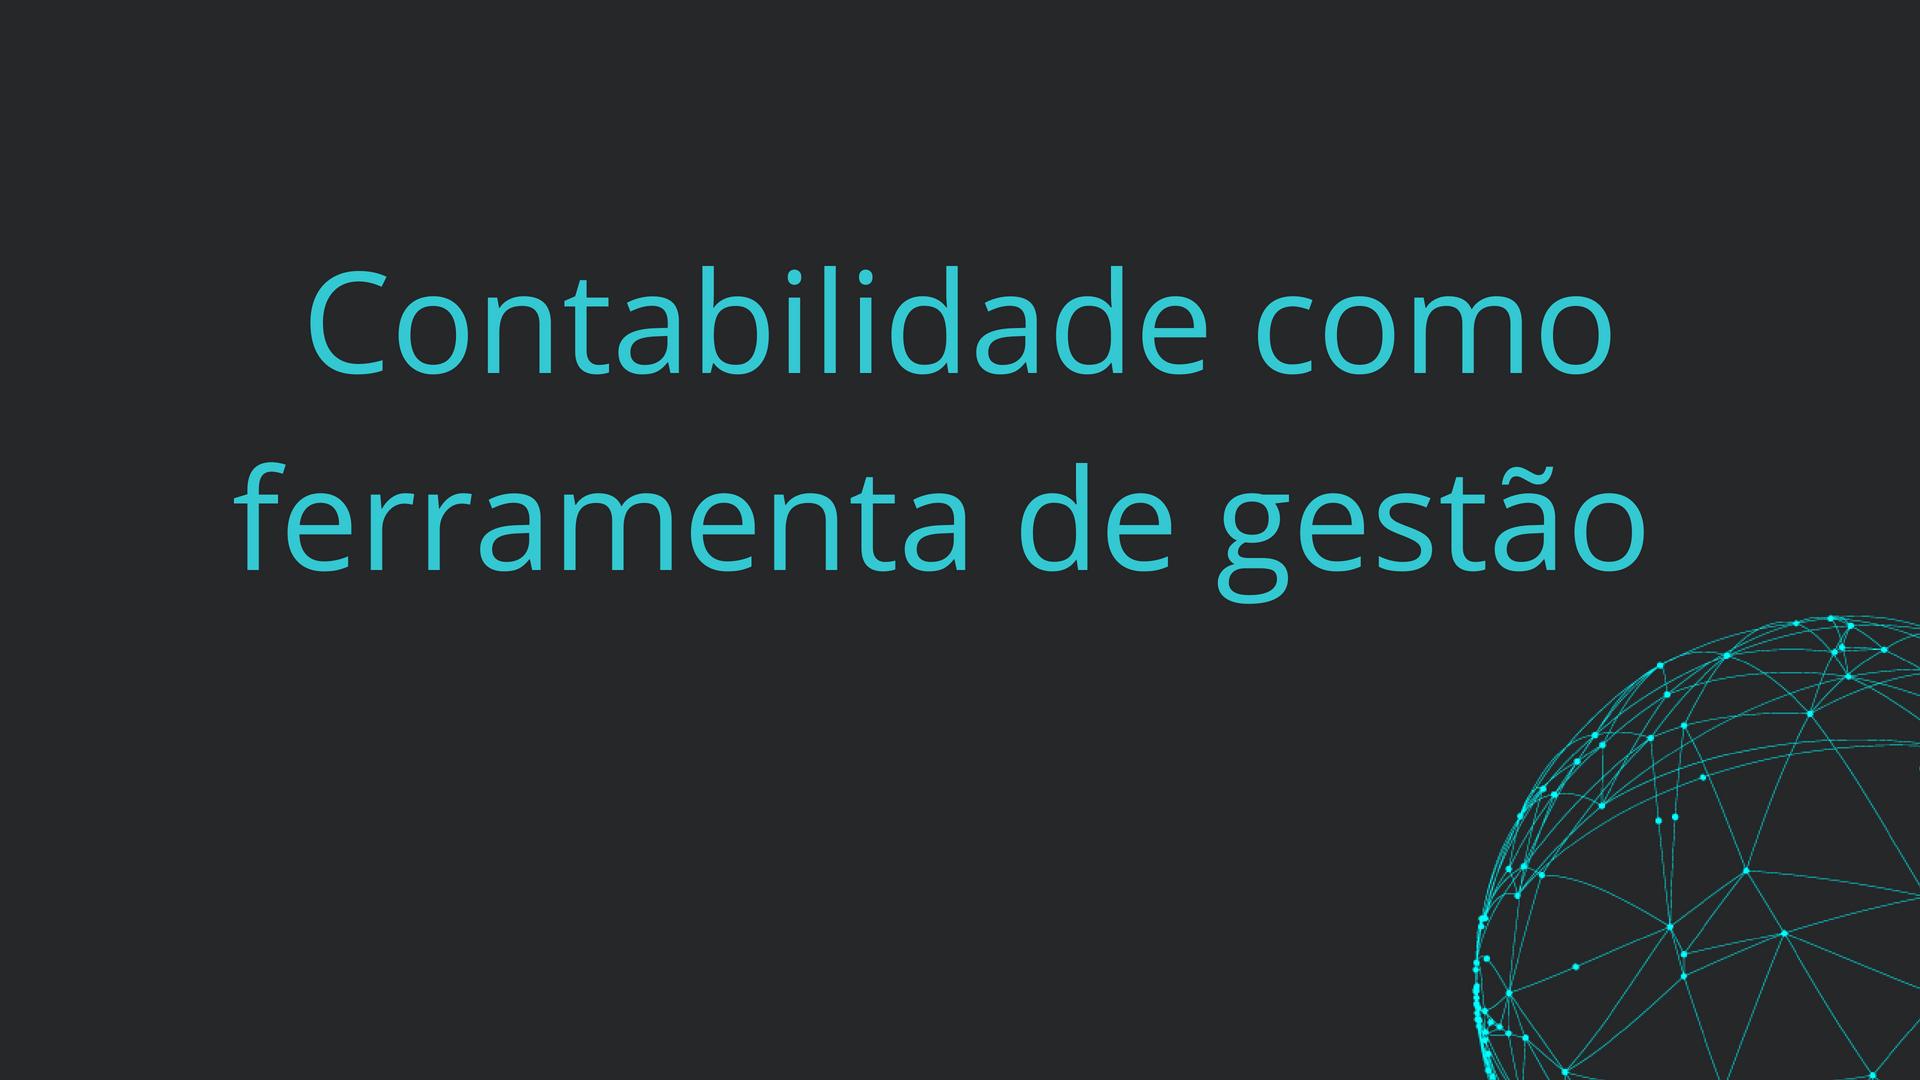 http://metododutra.com.br/novositedutra/wp-content/uploads/2018/08/3.1.png